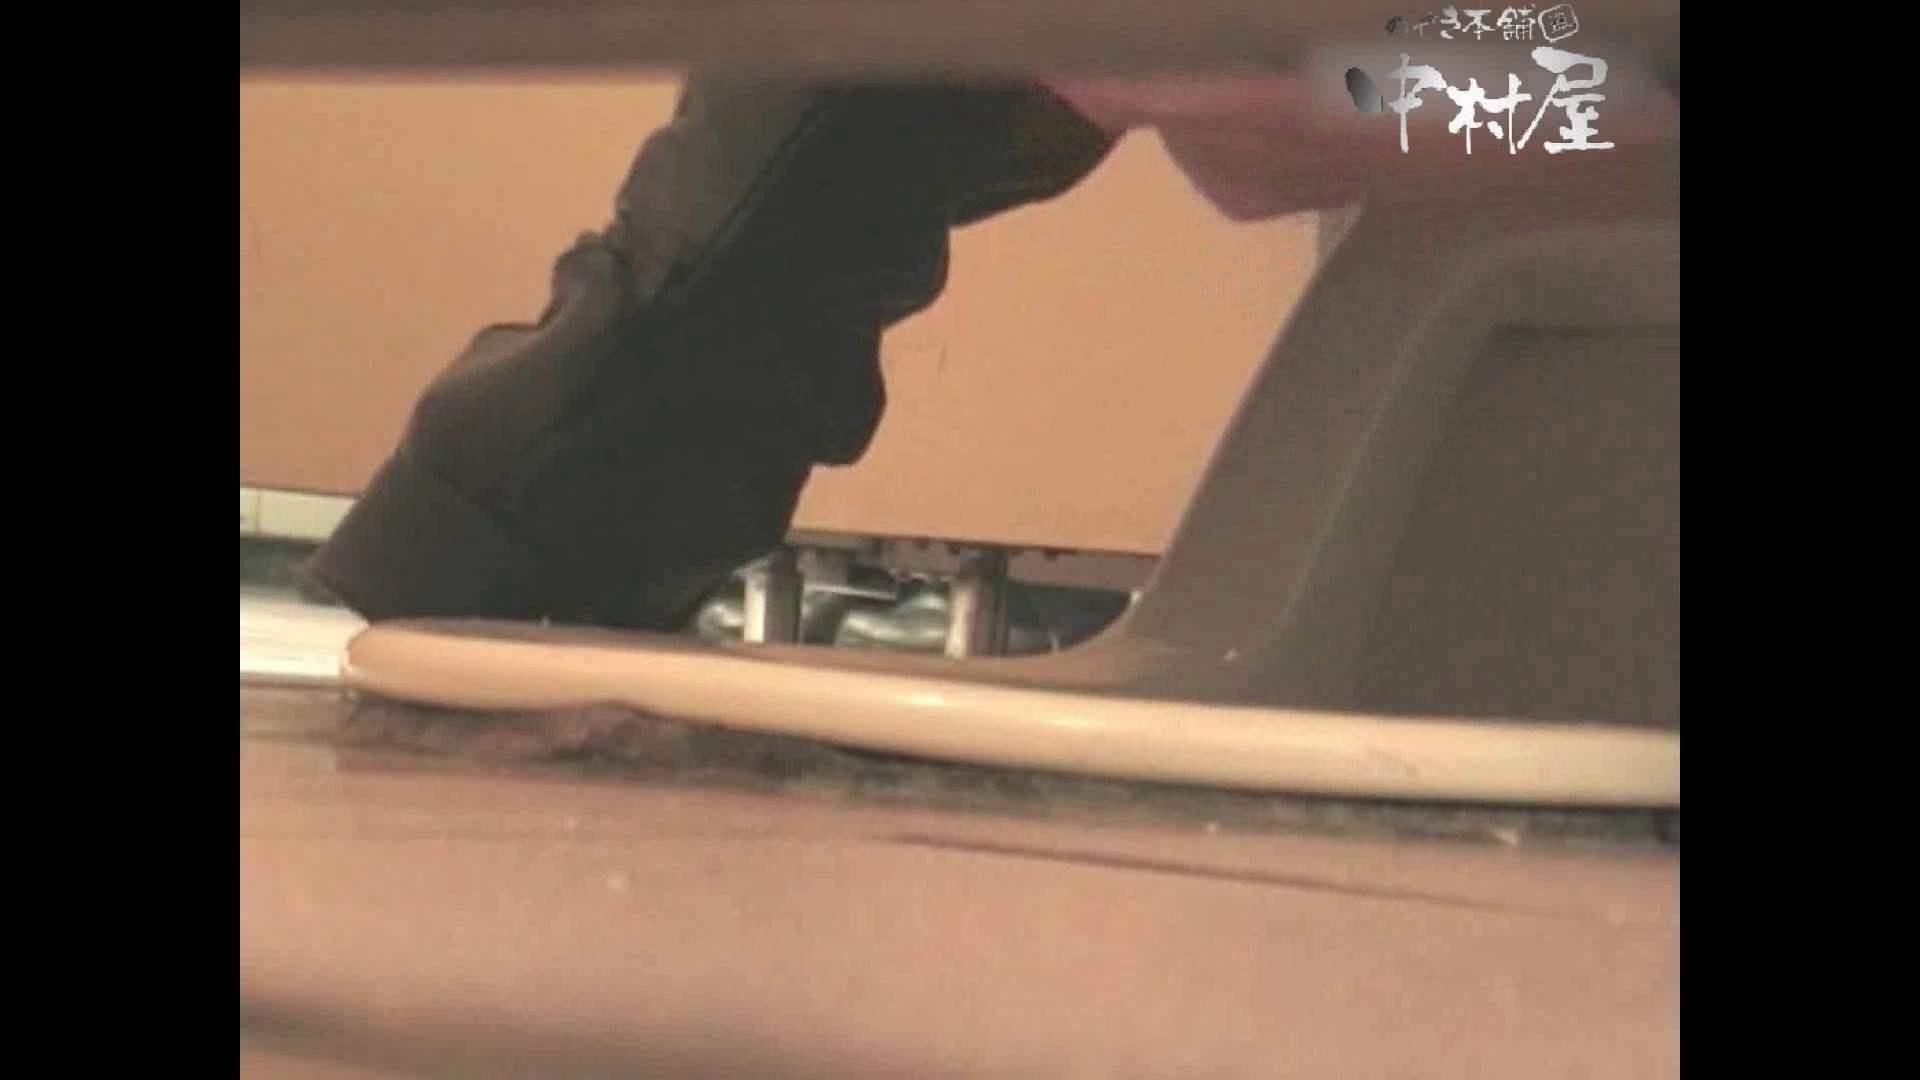 岩手県在住盗撮師盗撮記録vol.03 マンコ無修正 盗撮セックス無修正動画無料 99画像 88